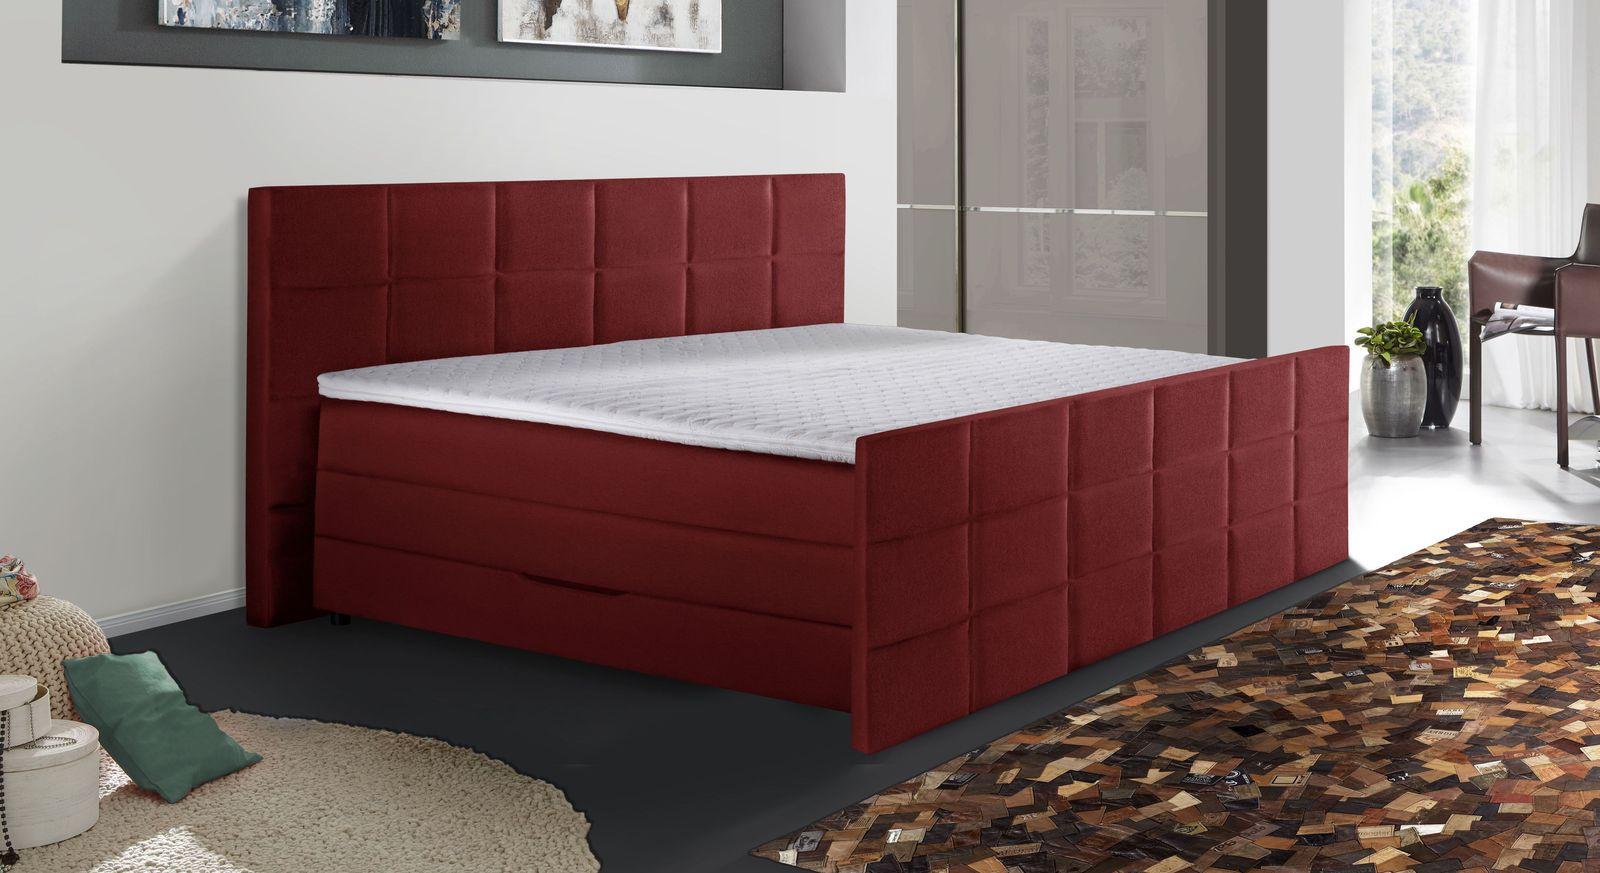 Bettkasten-Boxspringbett Cordilla mit rotem Stoffbezug